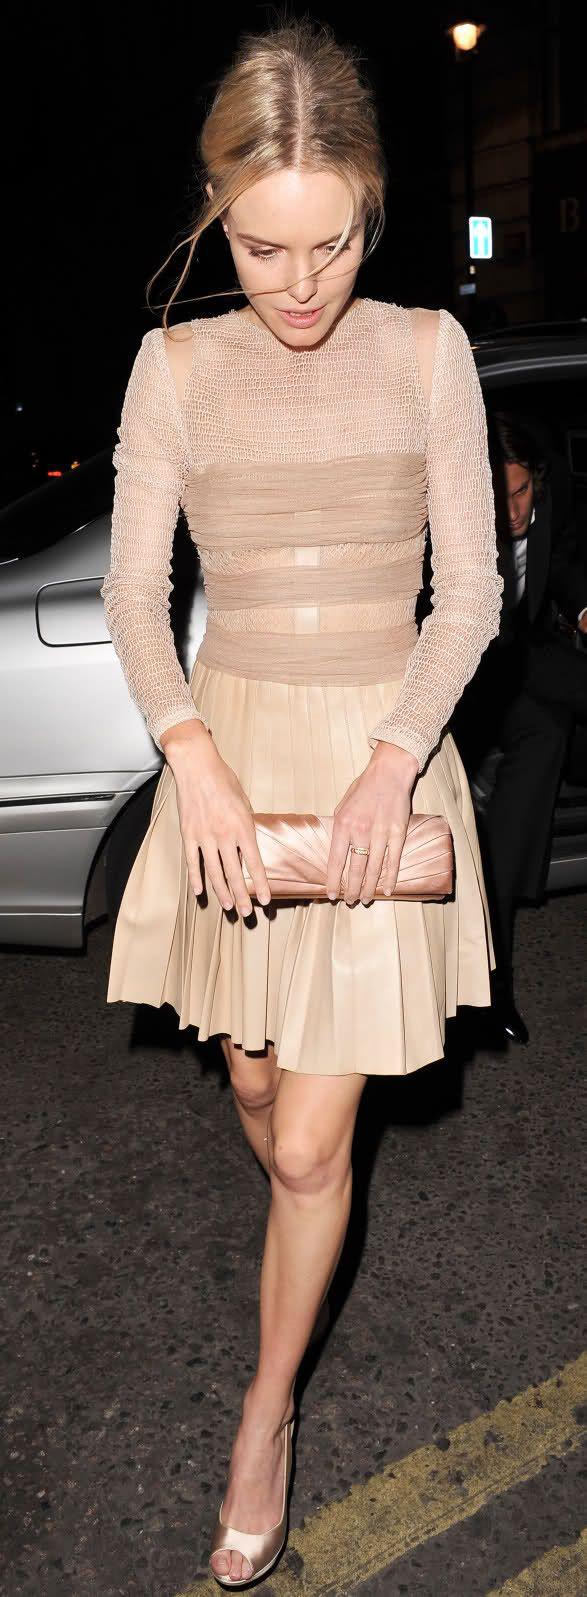 Kate Bosworth in Blush